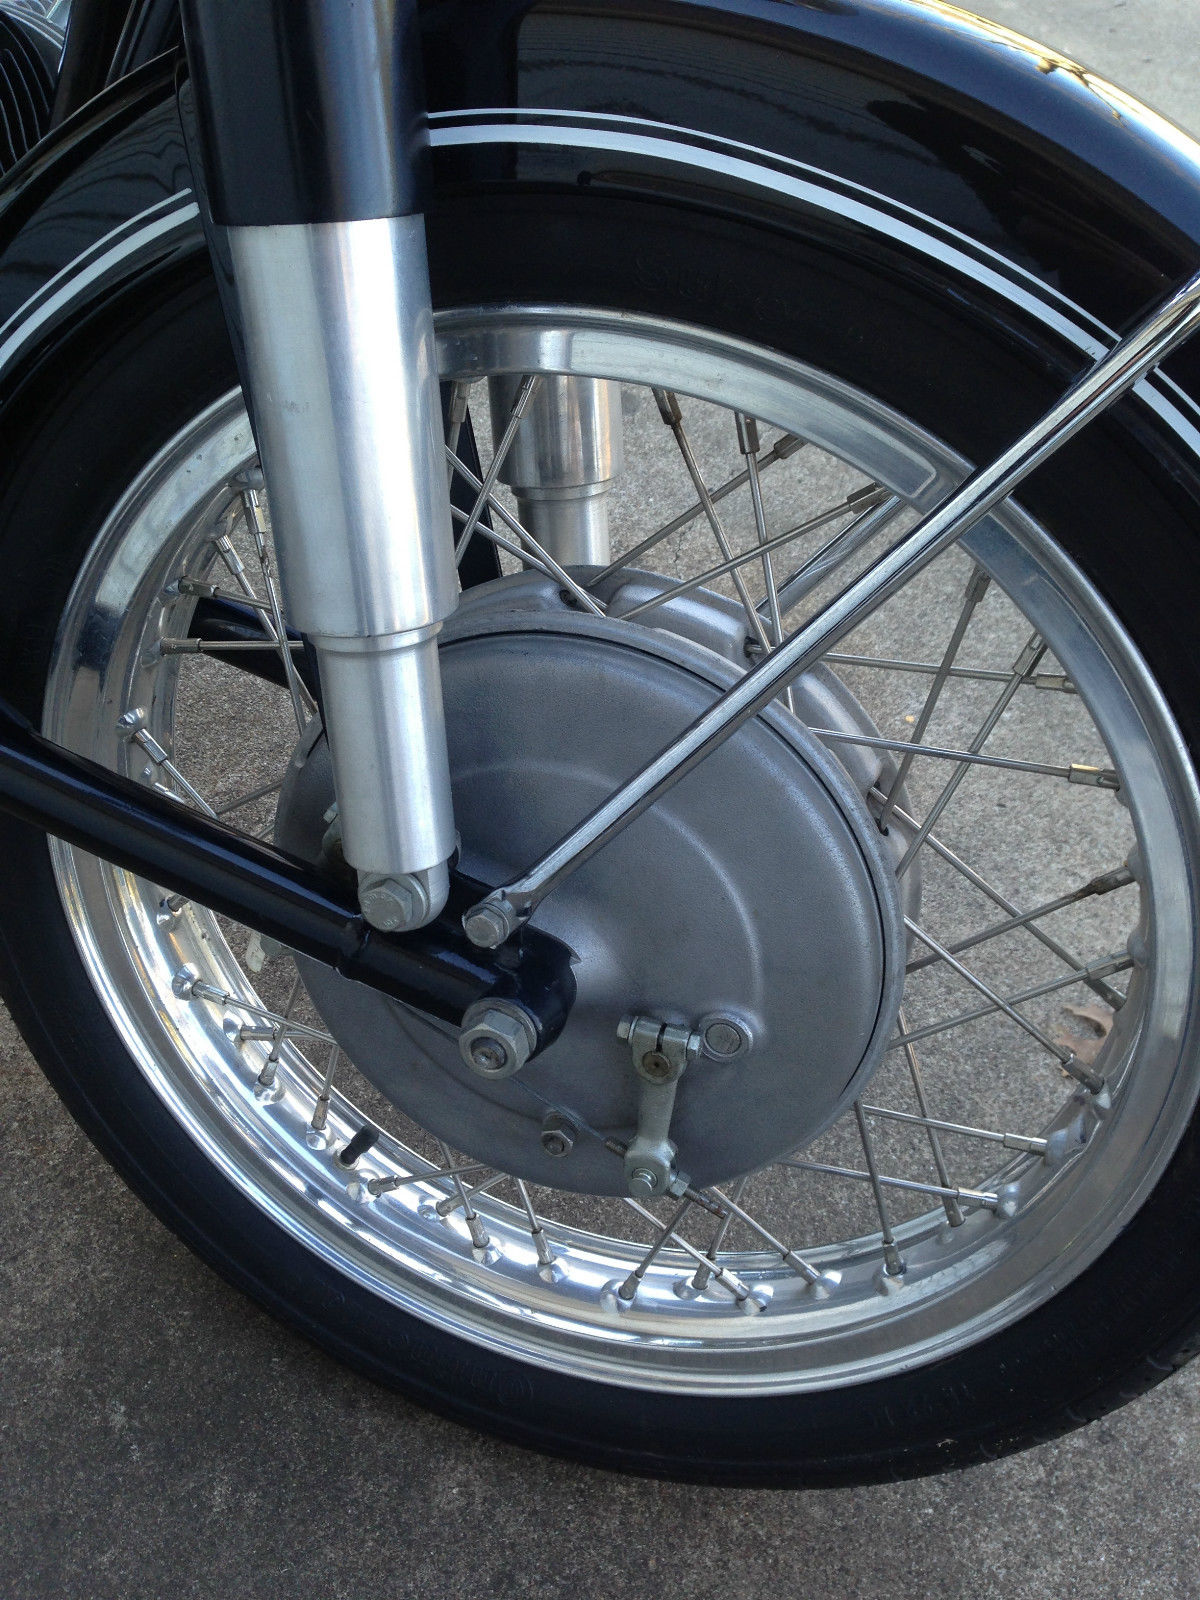 BMW R60/2 - 1967 - Front Wheel, Forks and Front Brake Hub.